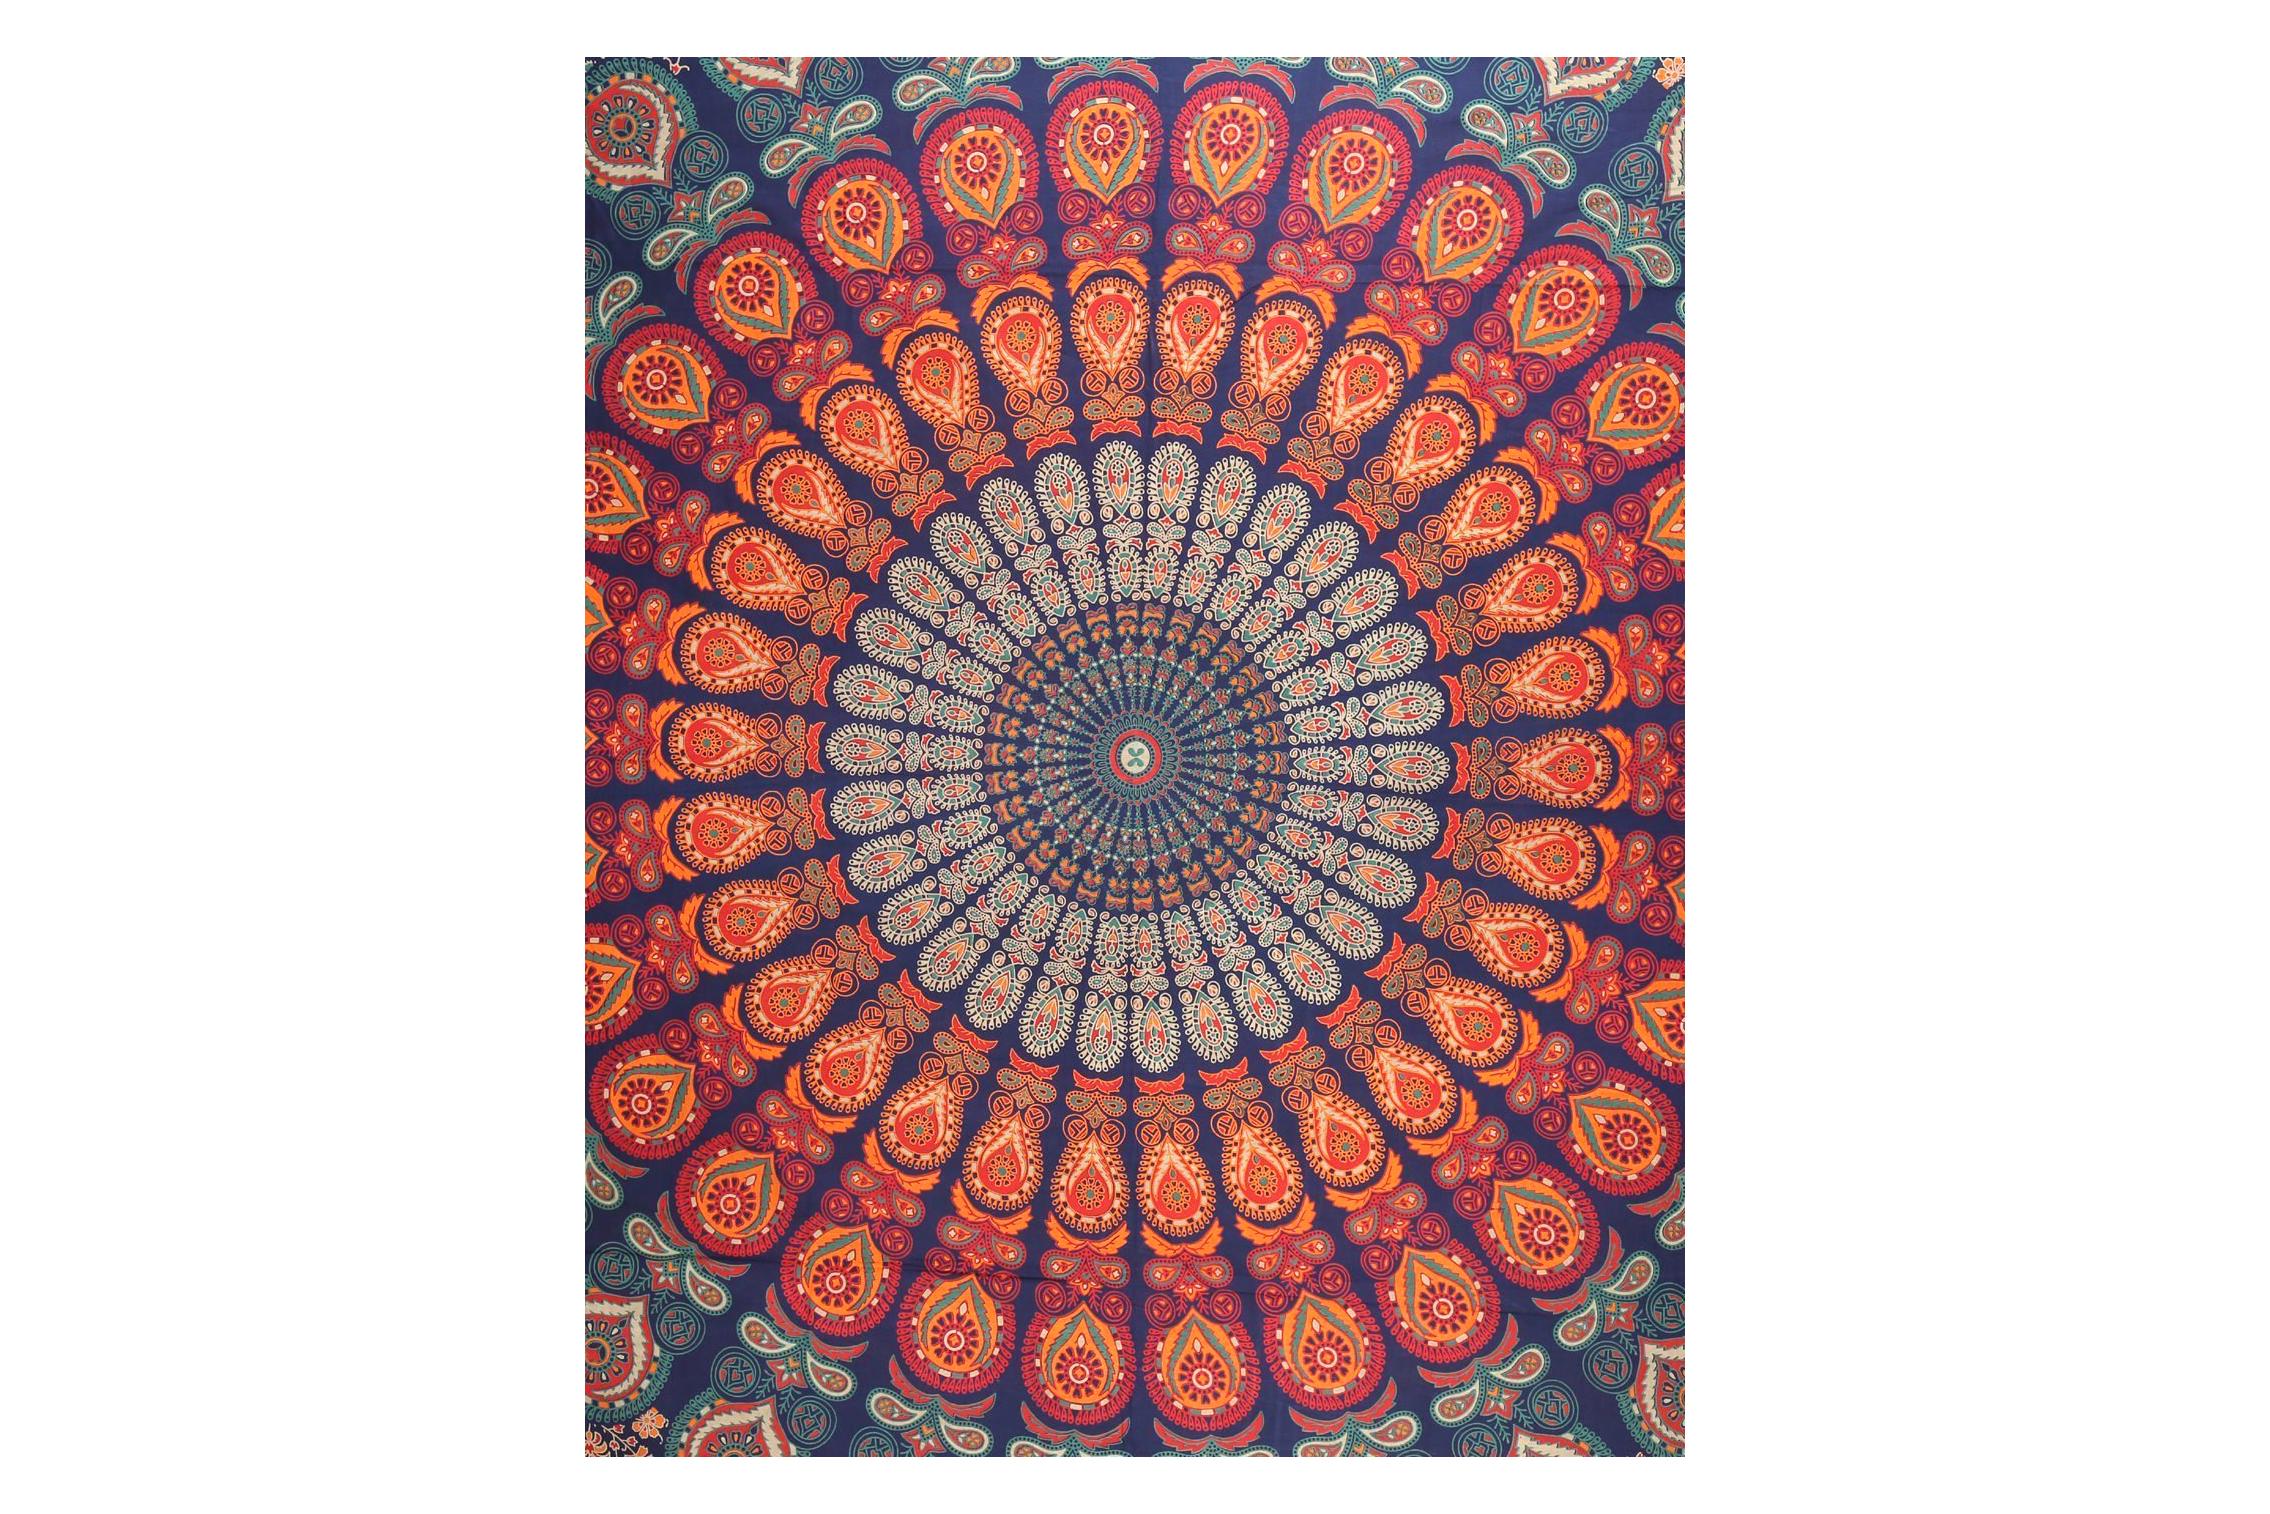 Mandala Tapestry -   8 x 7ft  4 stars -$11 (Prime)